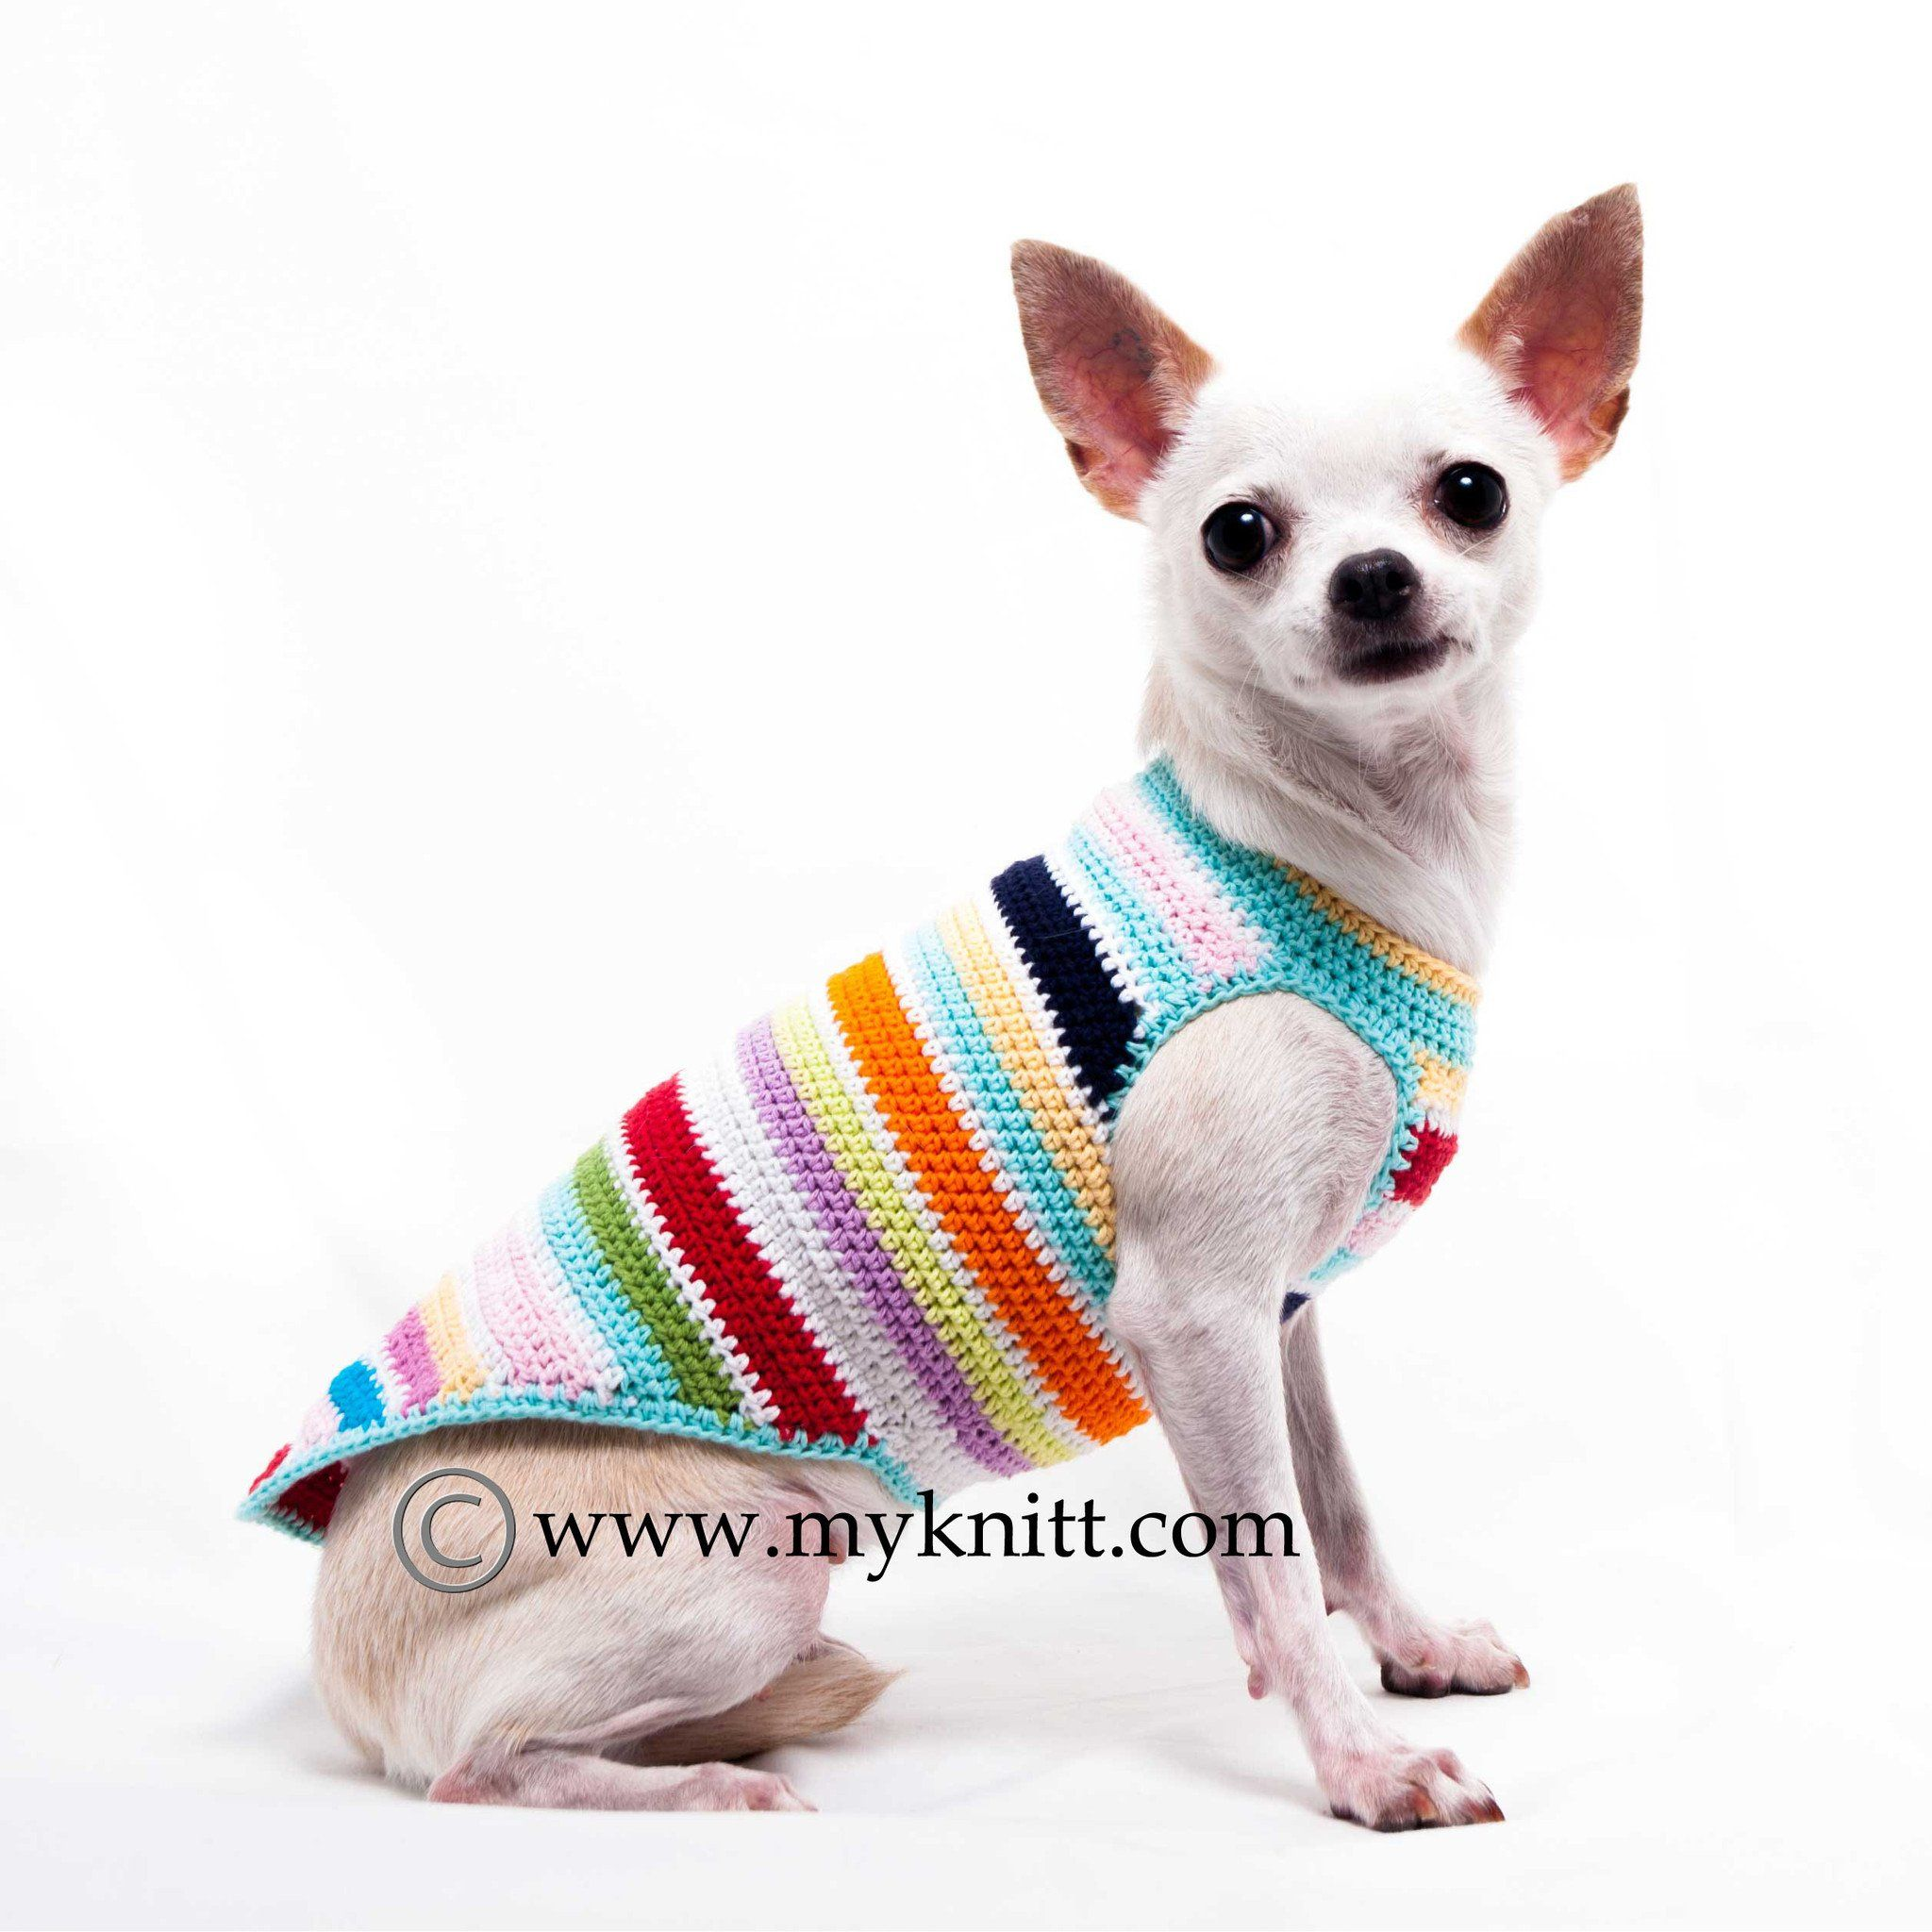 Colorful Cute Dog Clothes Cotton Handmade Crochet Dk995 Cute Dog